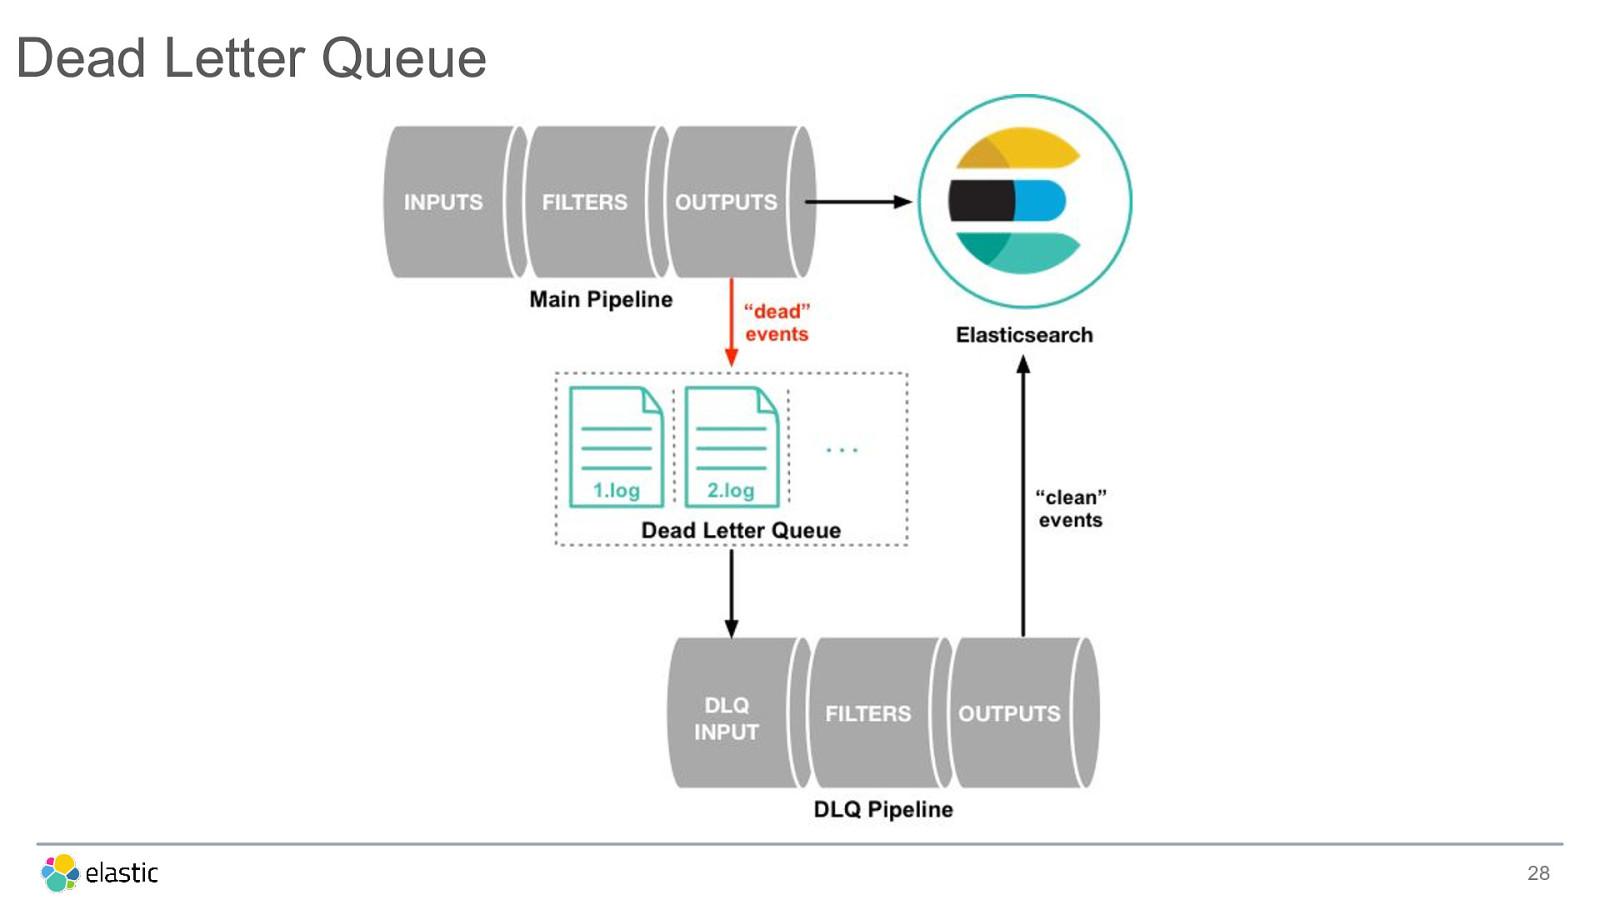 Ingest and Visualize Data using Logstash and Kibana